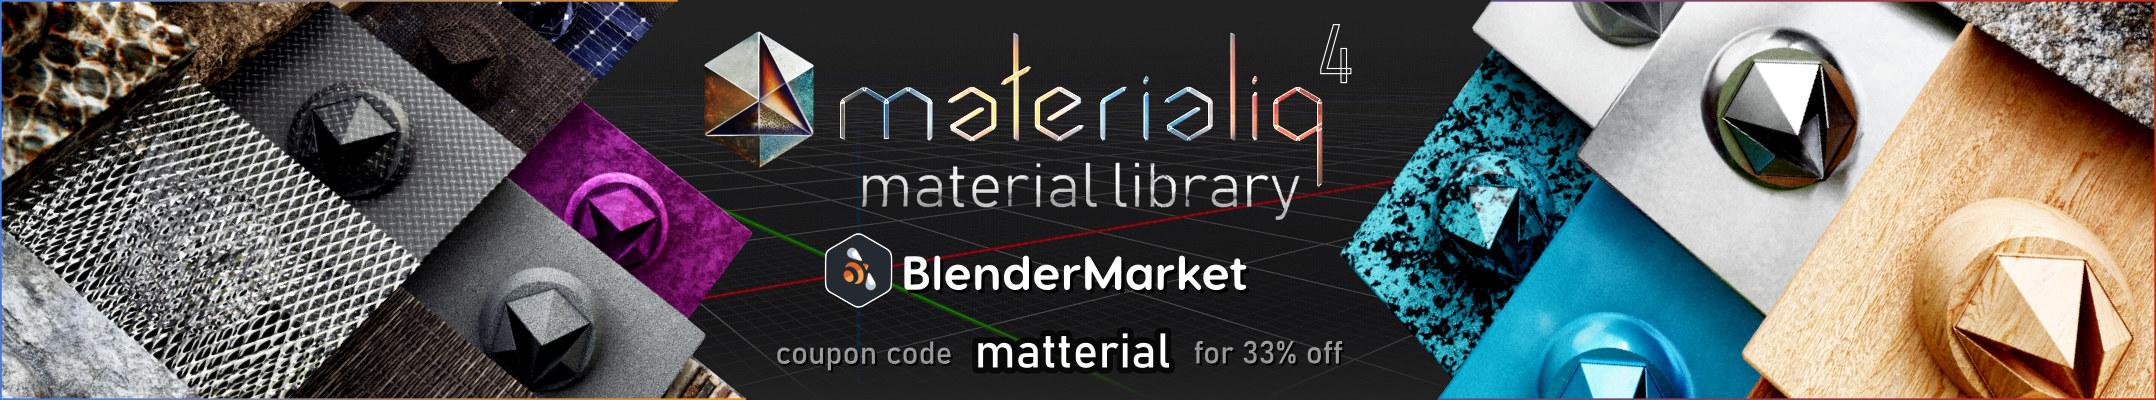 materialiq_banner_2156x400_Dark